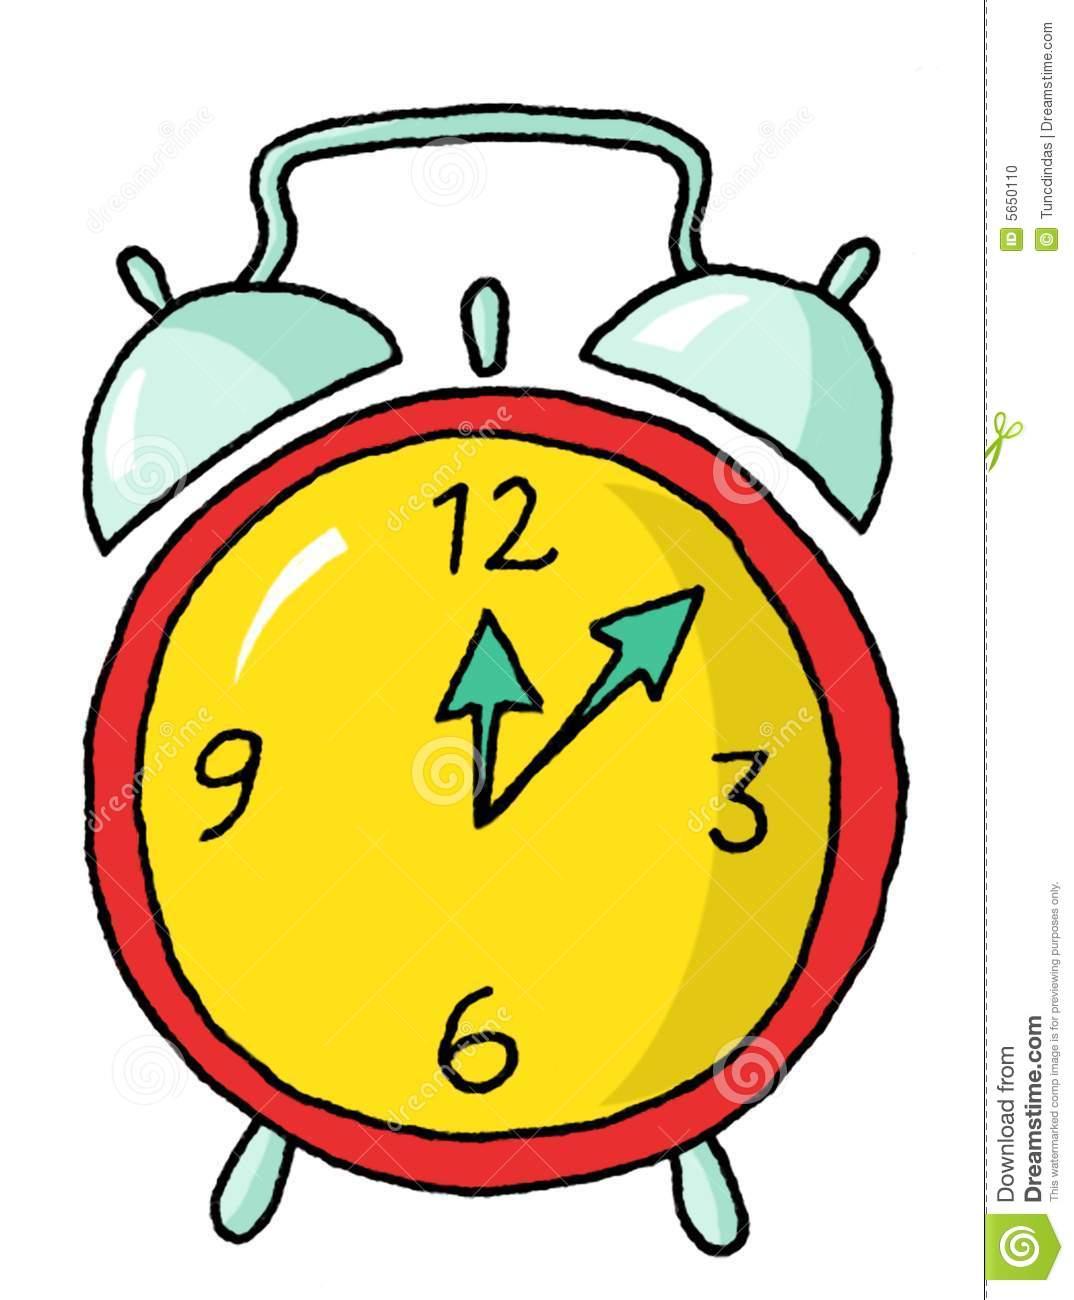 Alarm Clock 01 Stock Photo .-Alarm Clock 01 Stock Photo .-3